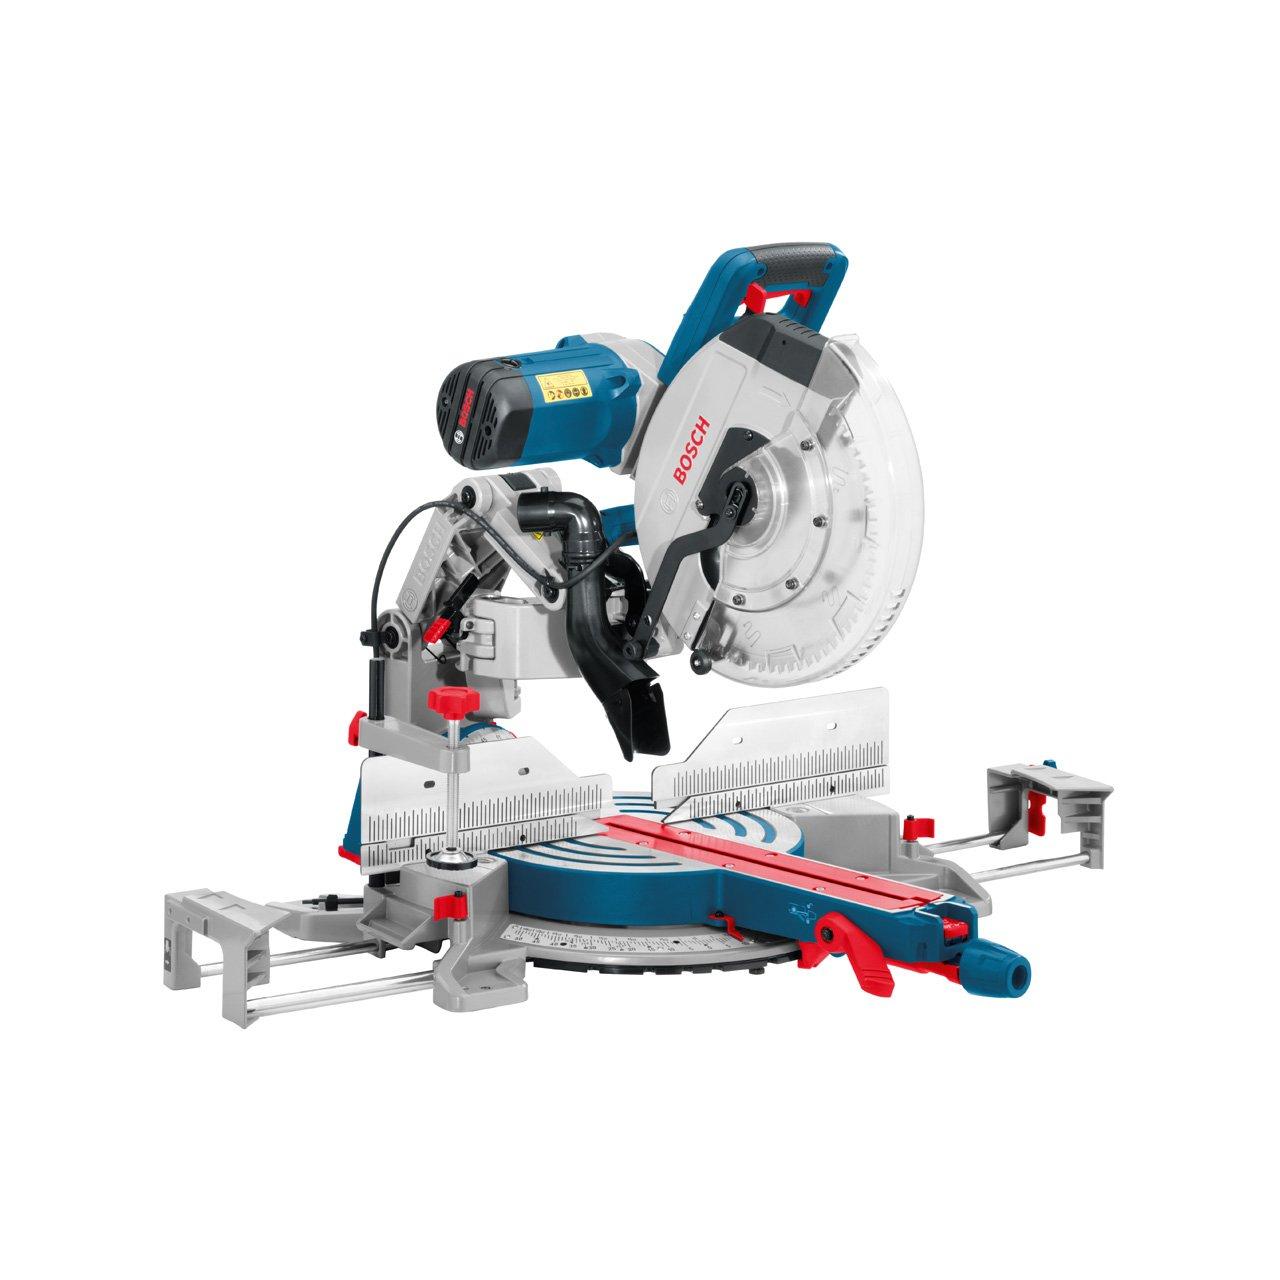 Scie à onglet radiale Bosch Professional 0601B23600 GCM 12 GDL 2000 W - Ø 305 mm+ extensions laterales et visee laser